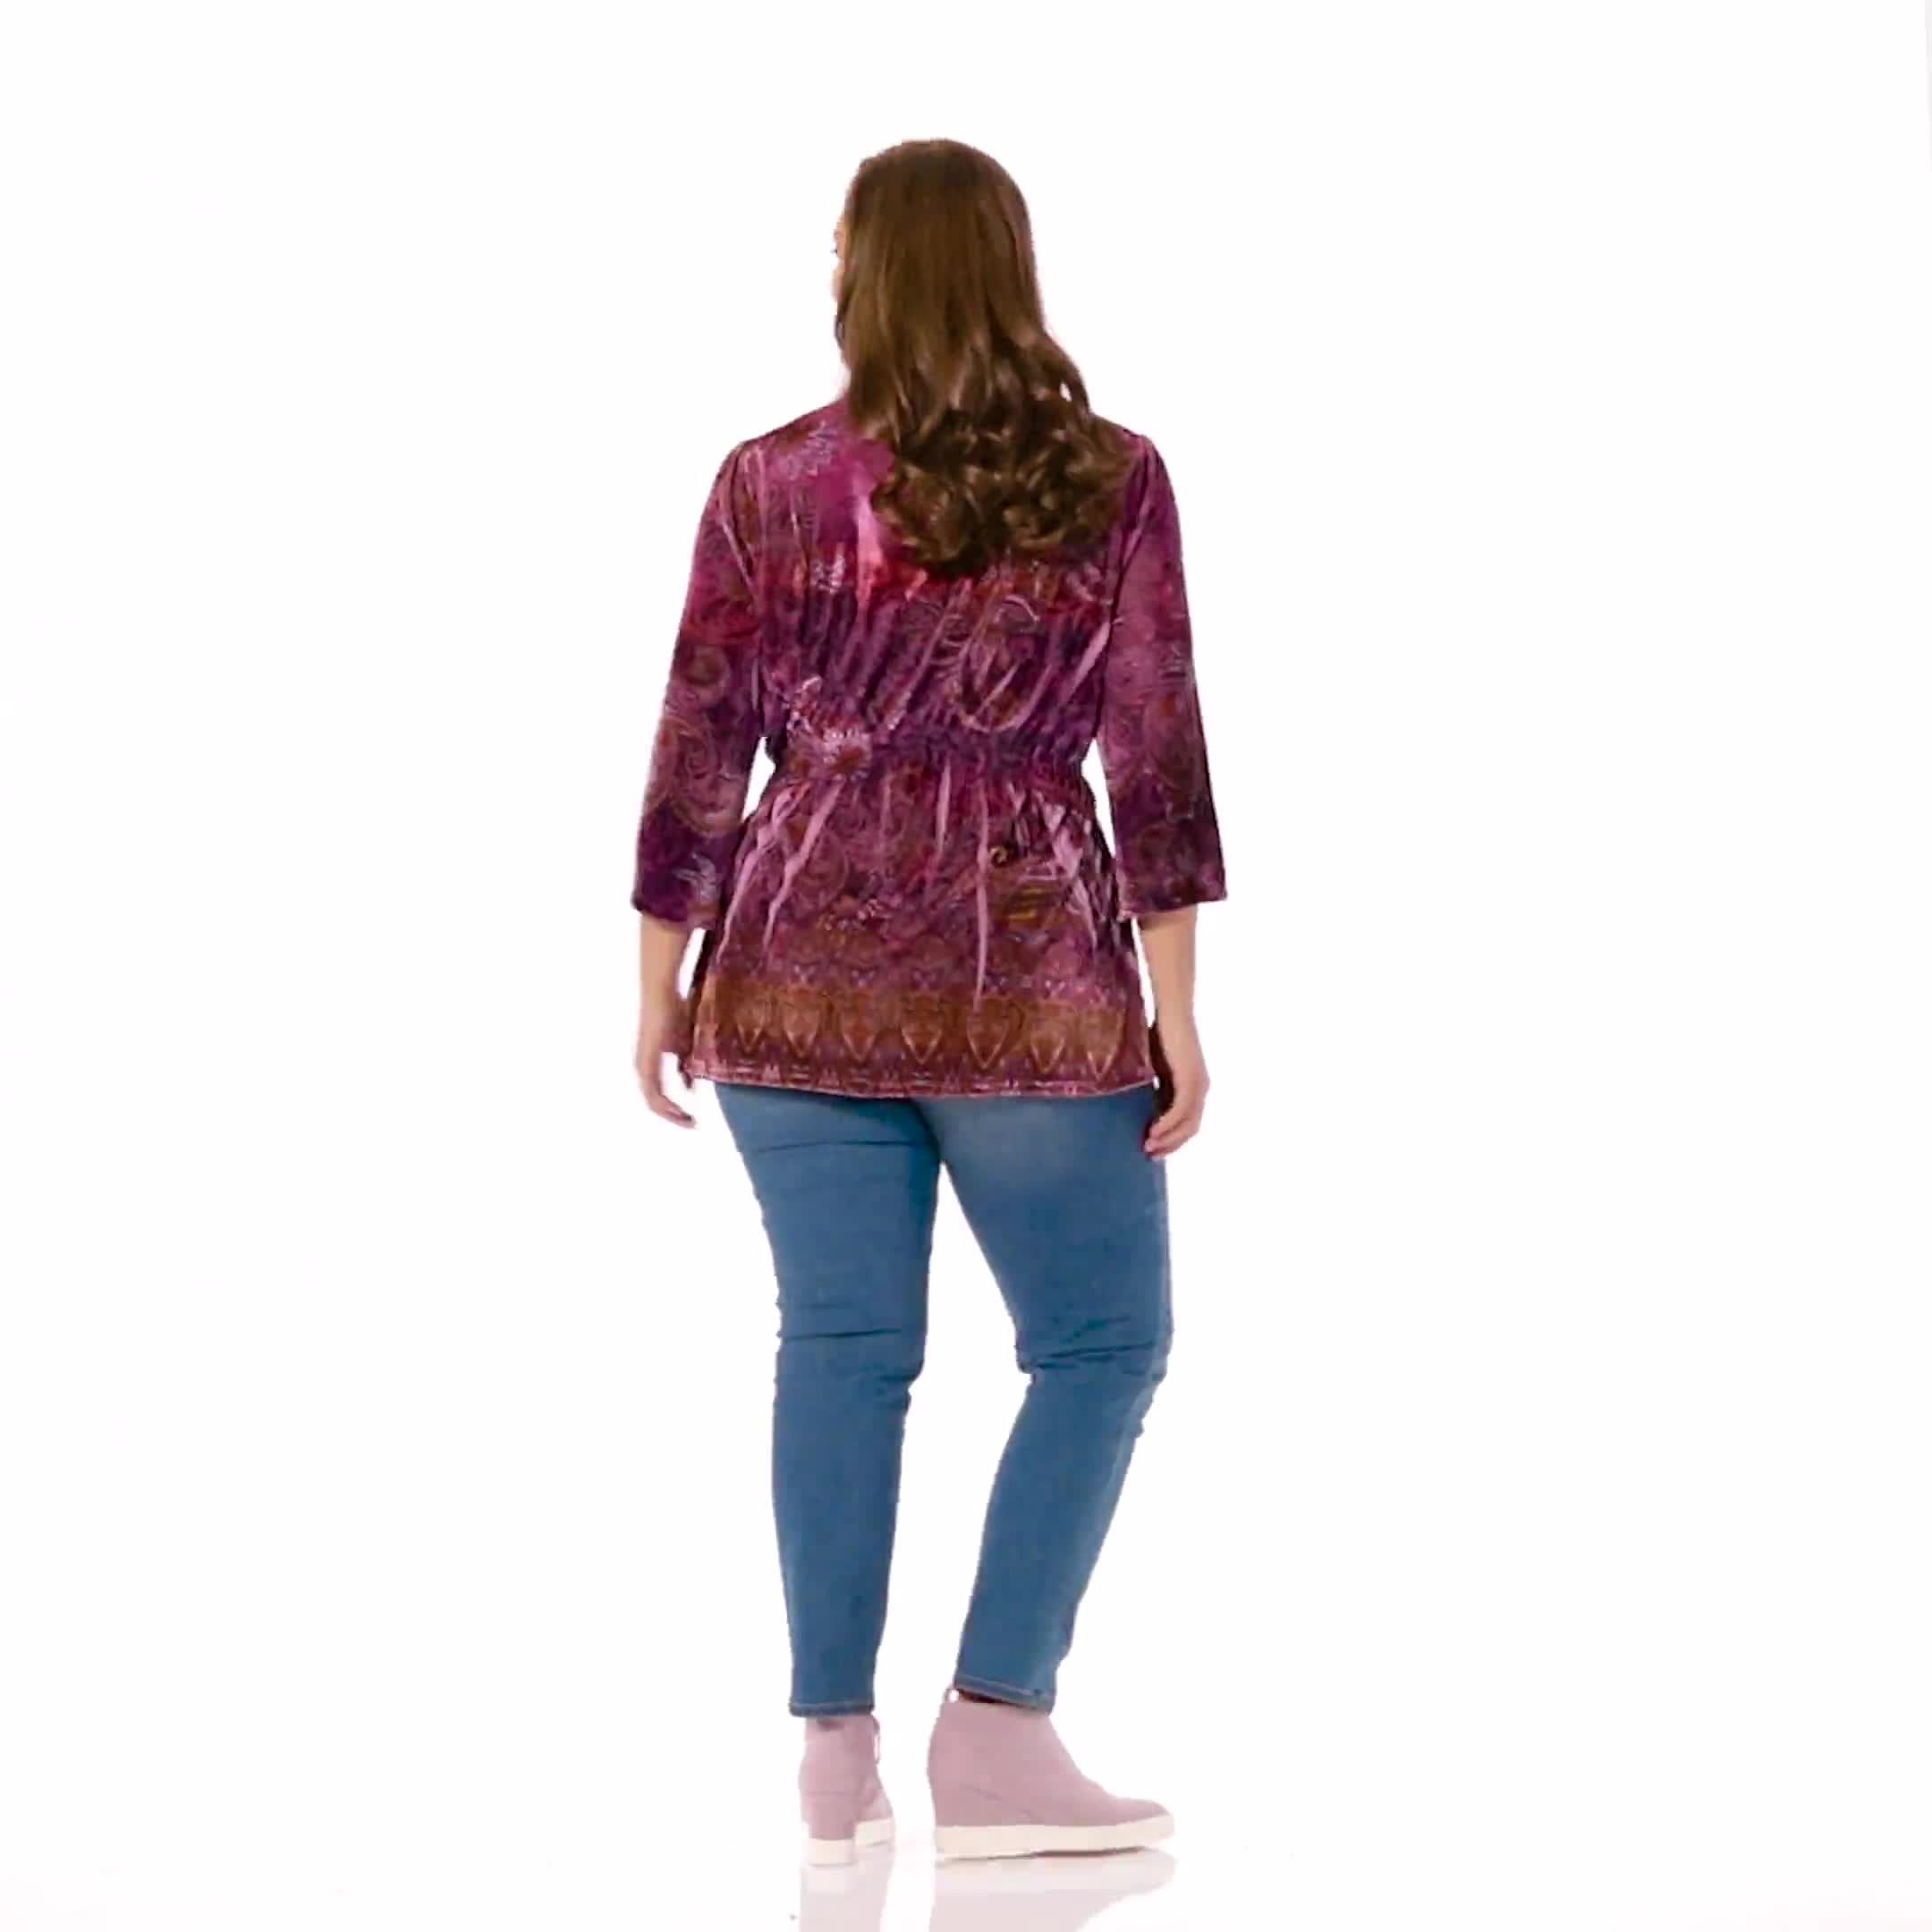 Influential Lady Velvet Knit Tunic Top - Plus - Video